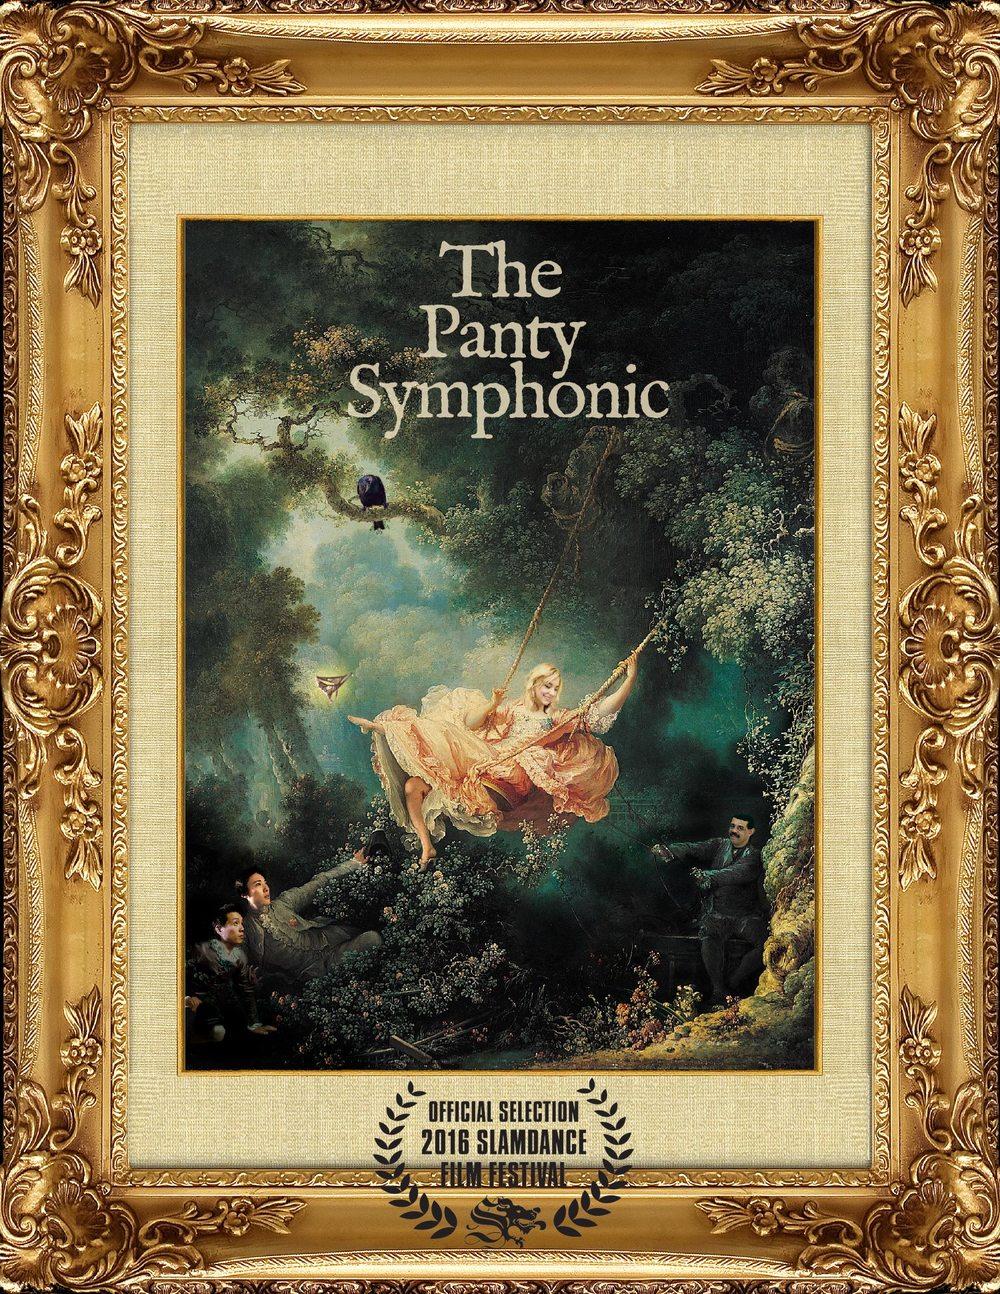 The official movie poster for the 2016 Slamdance Film Festival.